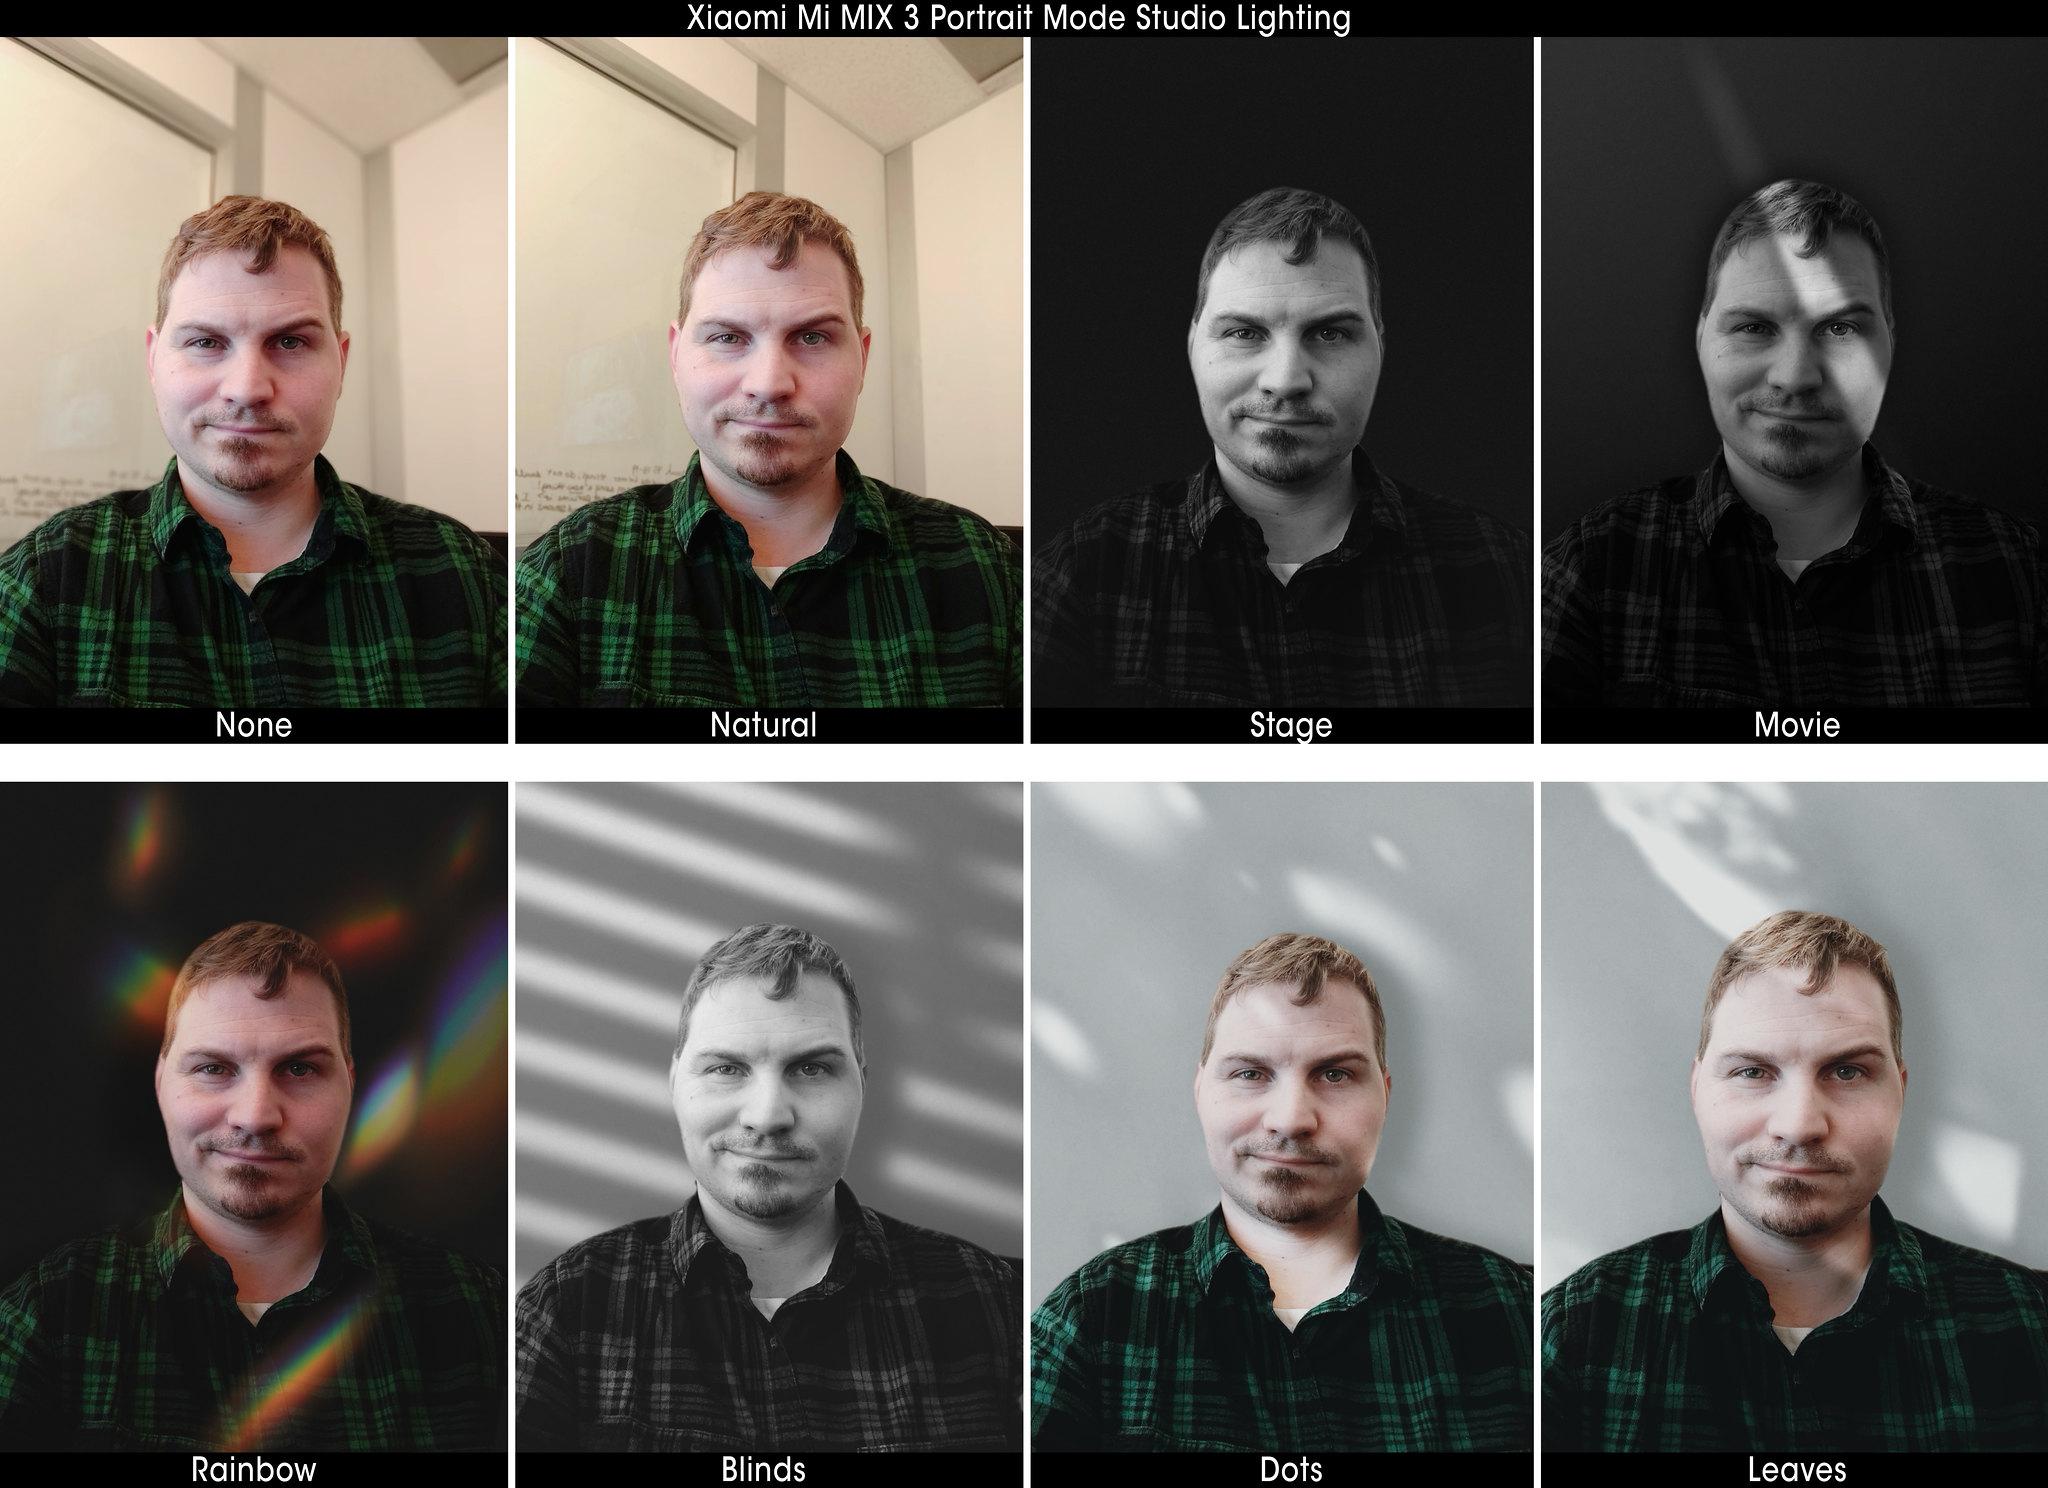 xiaomi-mi-mix-3-ah-ns-portrait-mode-studio-lighting